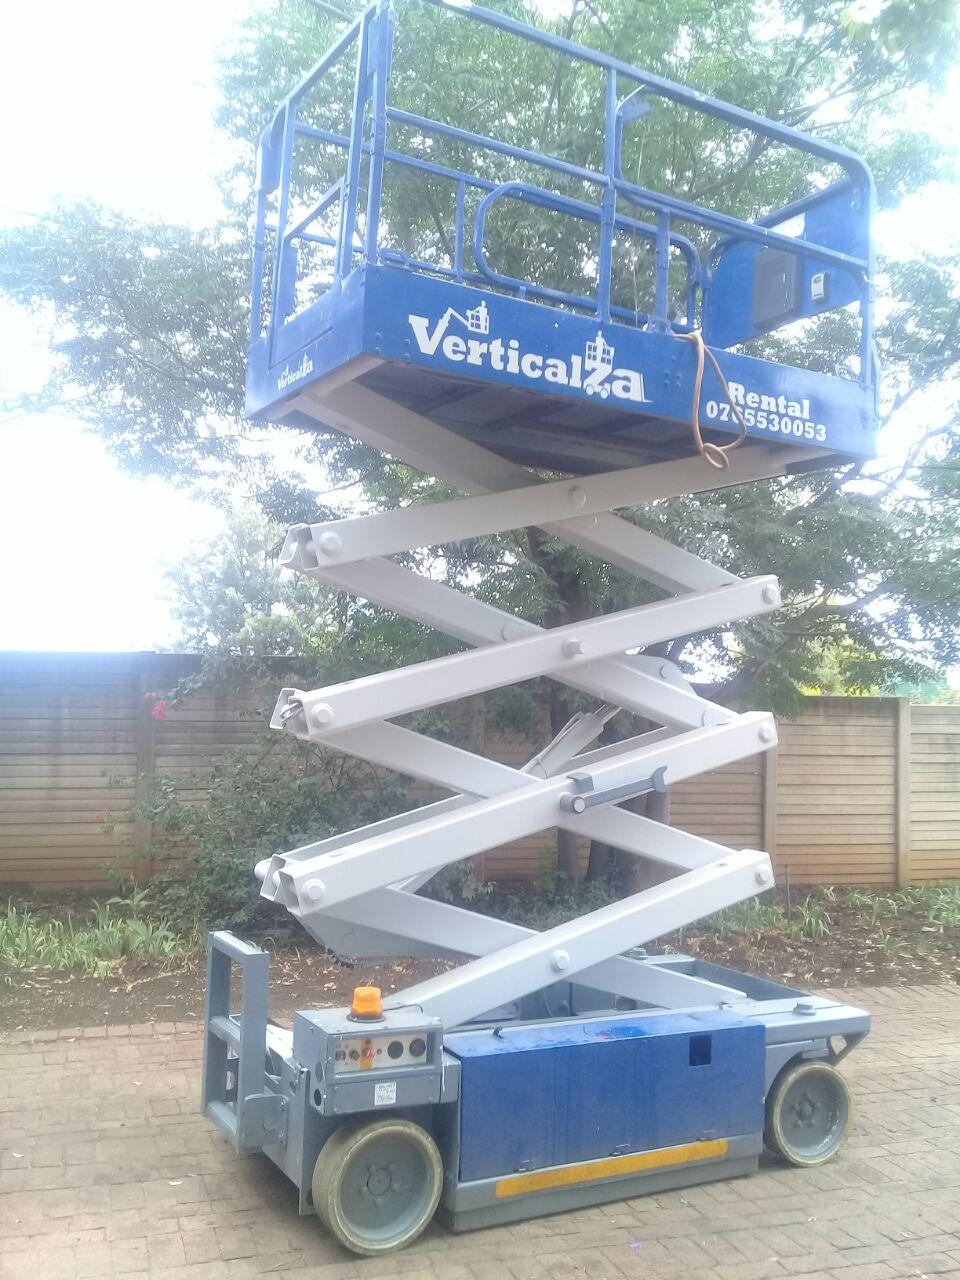 VerticalZA MEC 2647ES - 10m Electrical Scissor Lift cherry picker Manlift |  Junk Mail